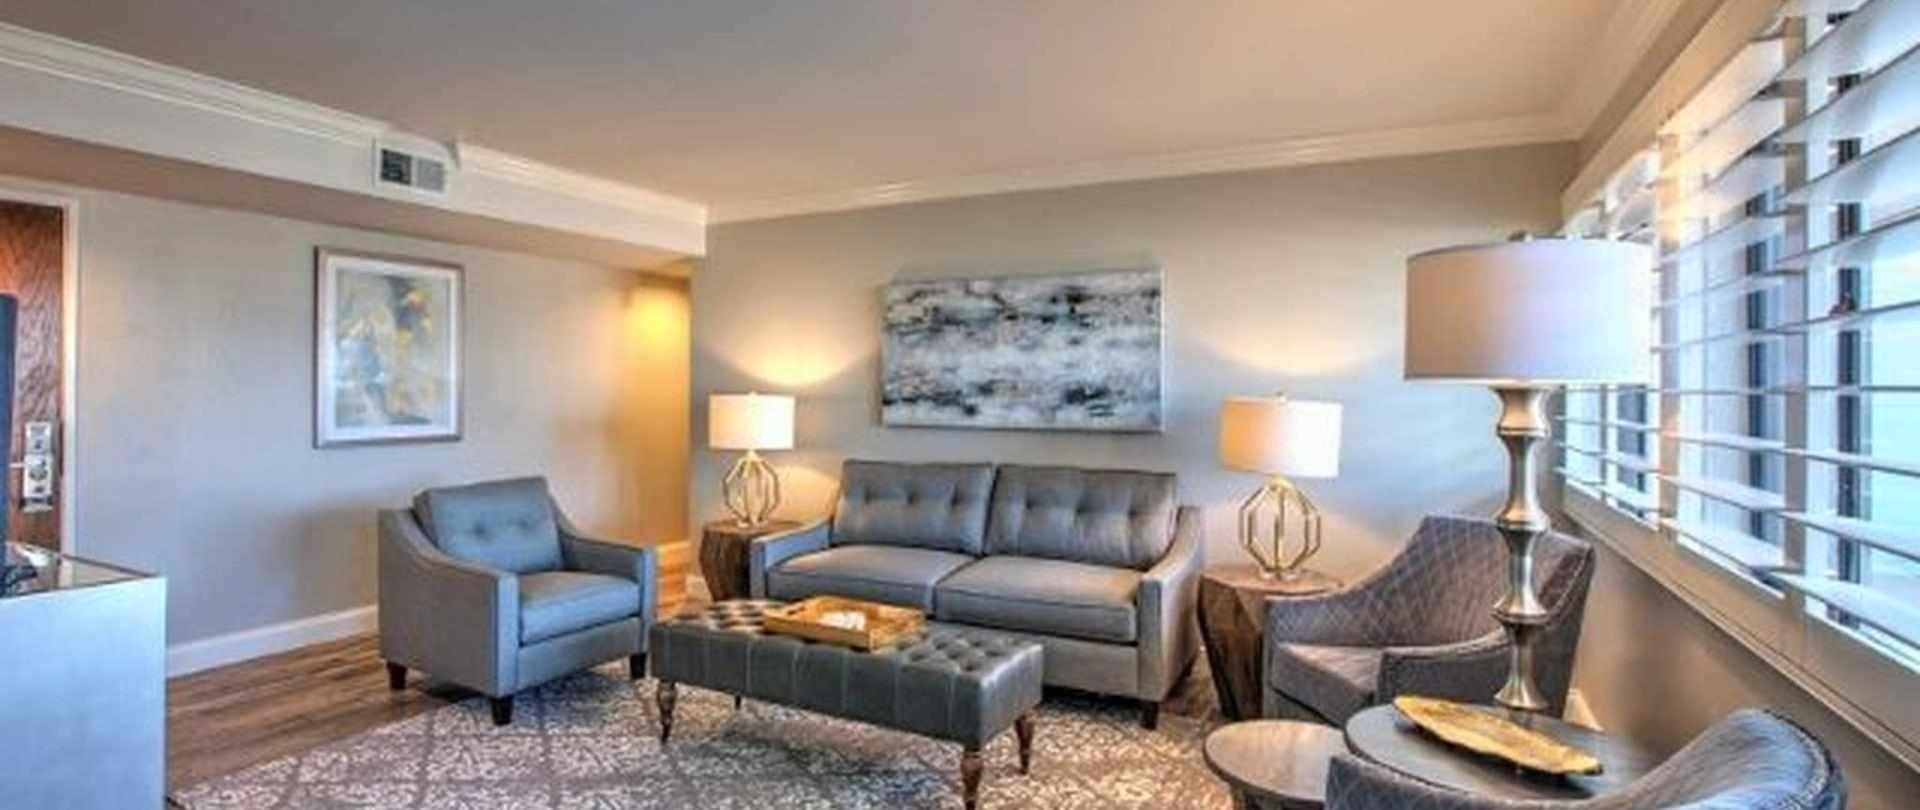 livingroom4版本-2-3-JPG,resize.jpg.1920x810_default.jpeg.1920x0.jpeg